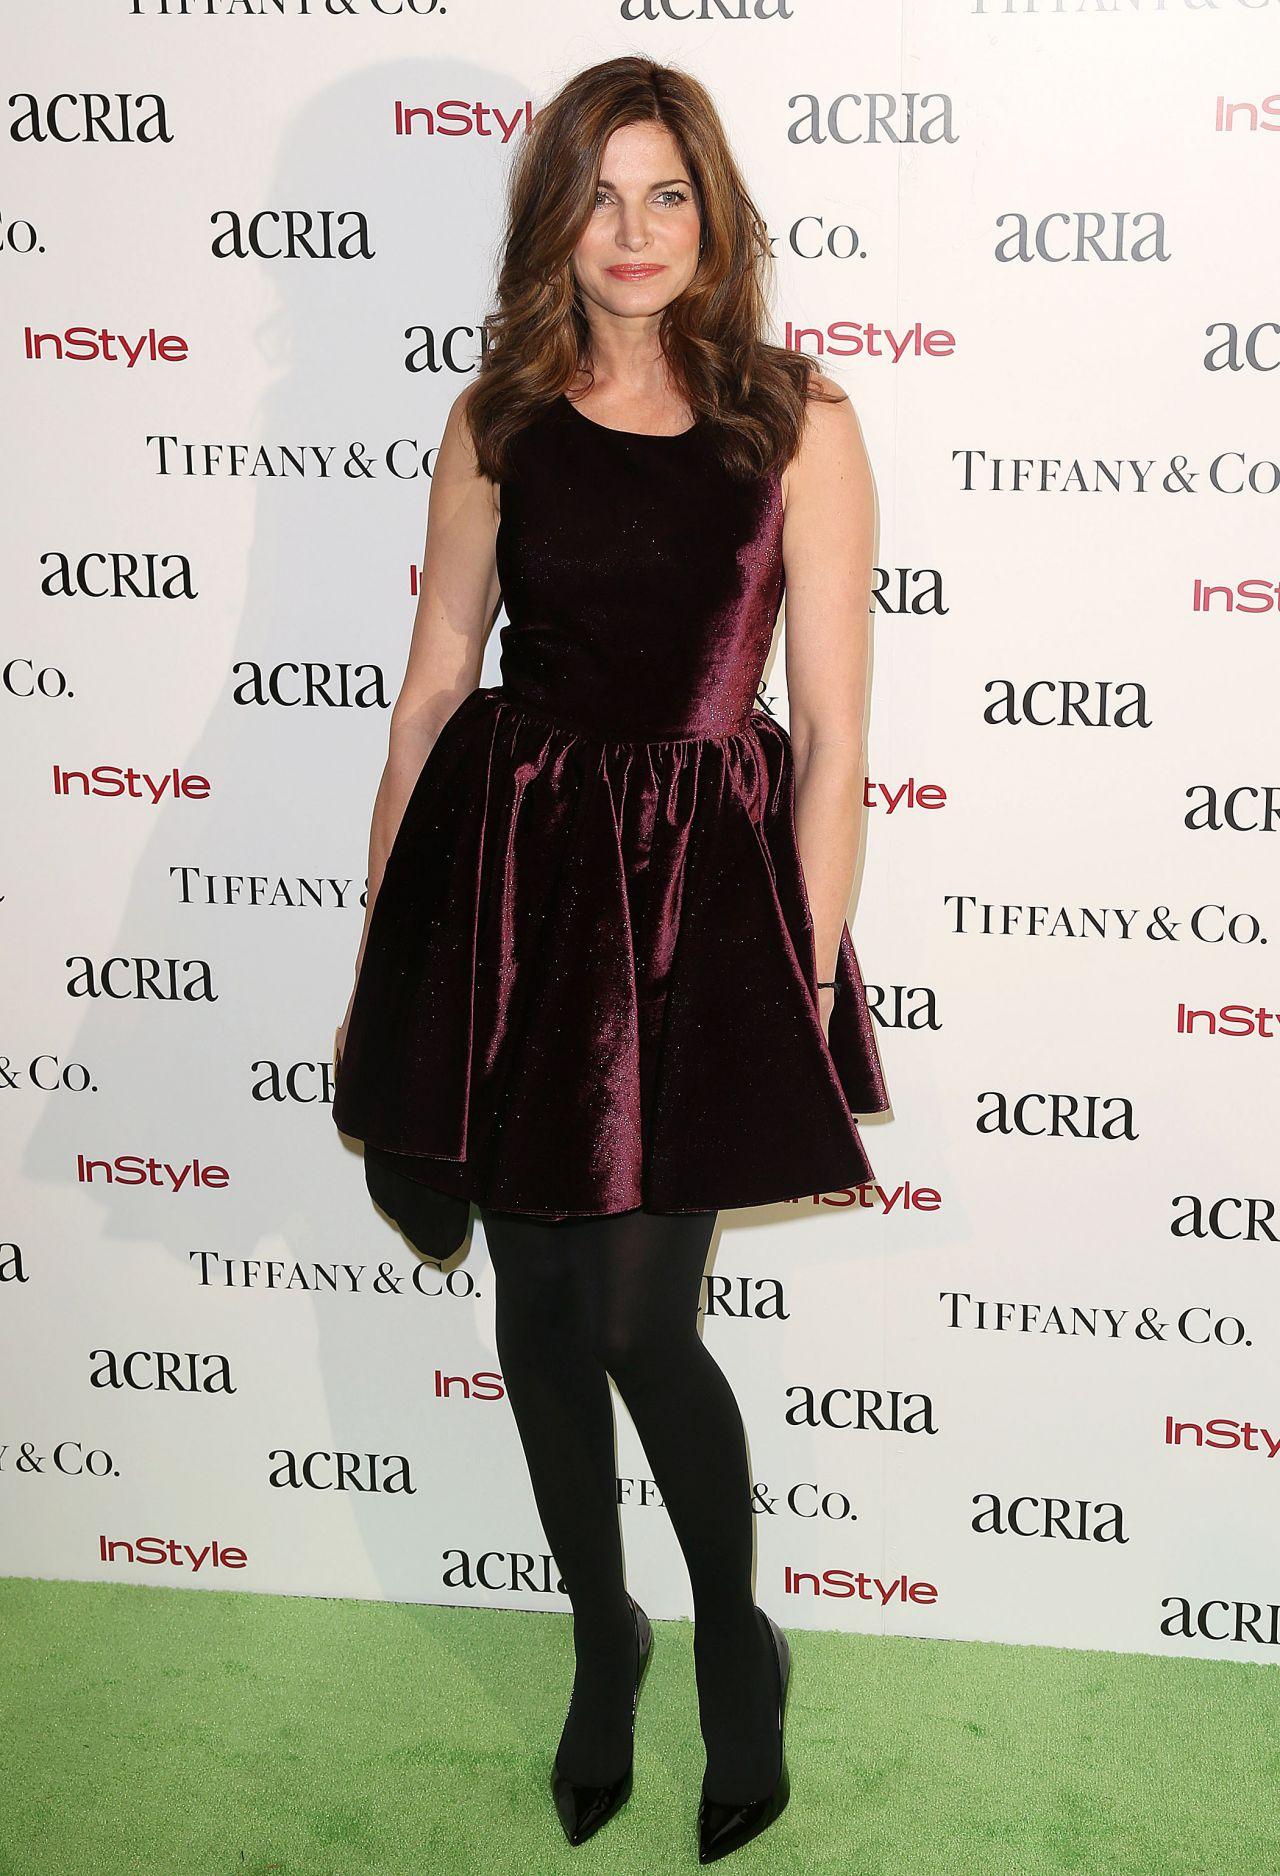 Stephanie Seymour - 2014 Acria Holiday Dinner In New York City-1160